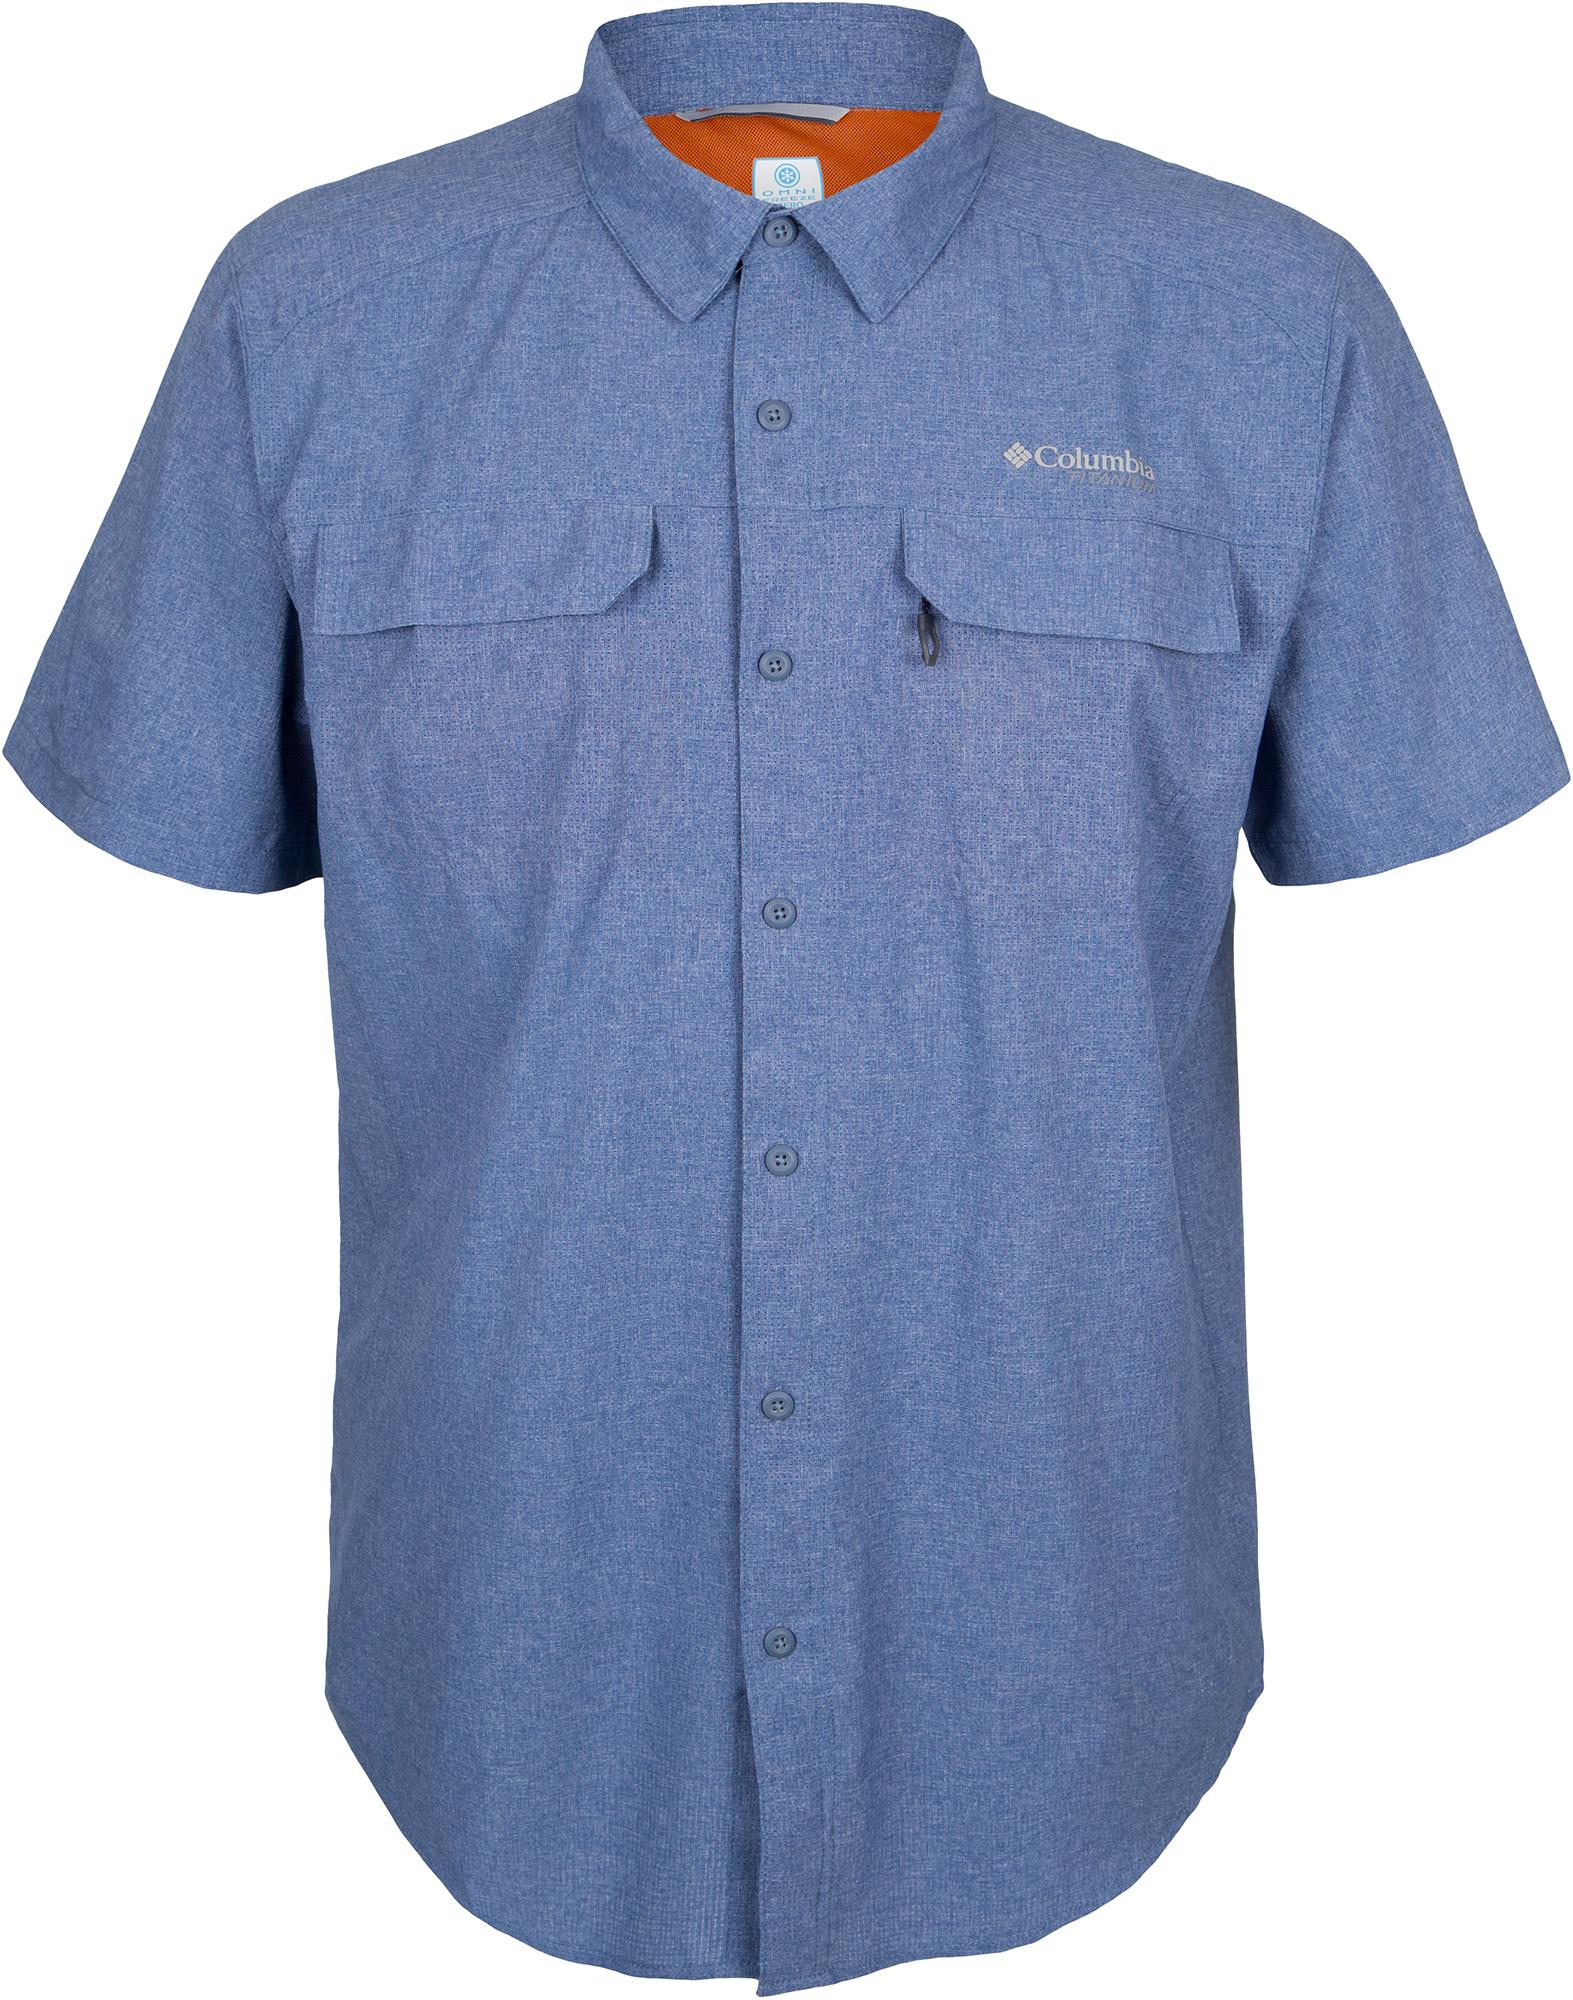 Columbia Рубашка мужская Columbia Irico, размер 56-58 рубашка мужская jeep jw11wh042